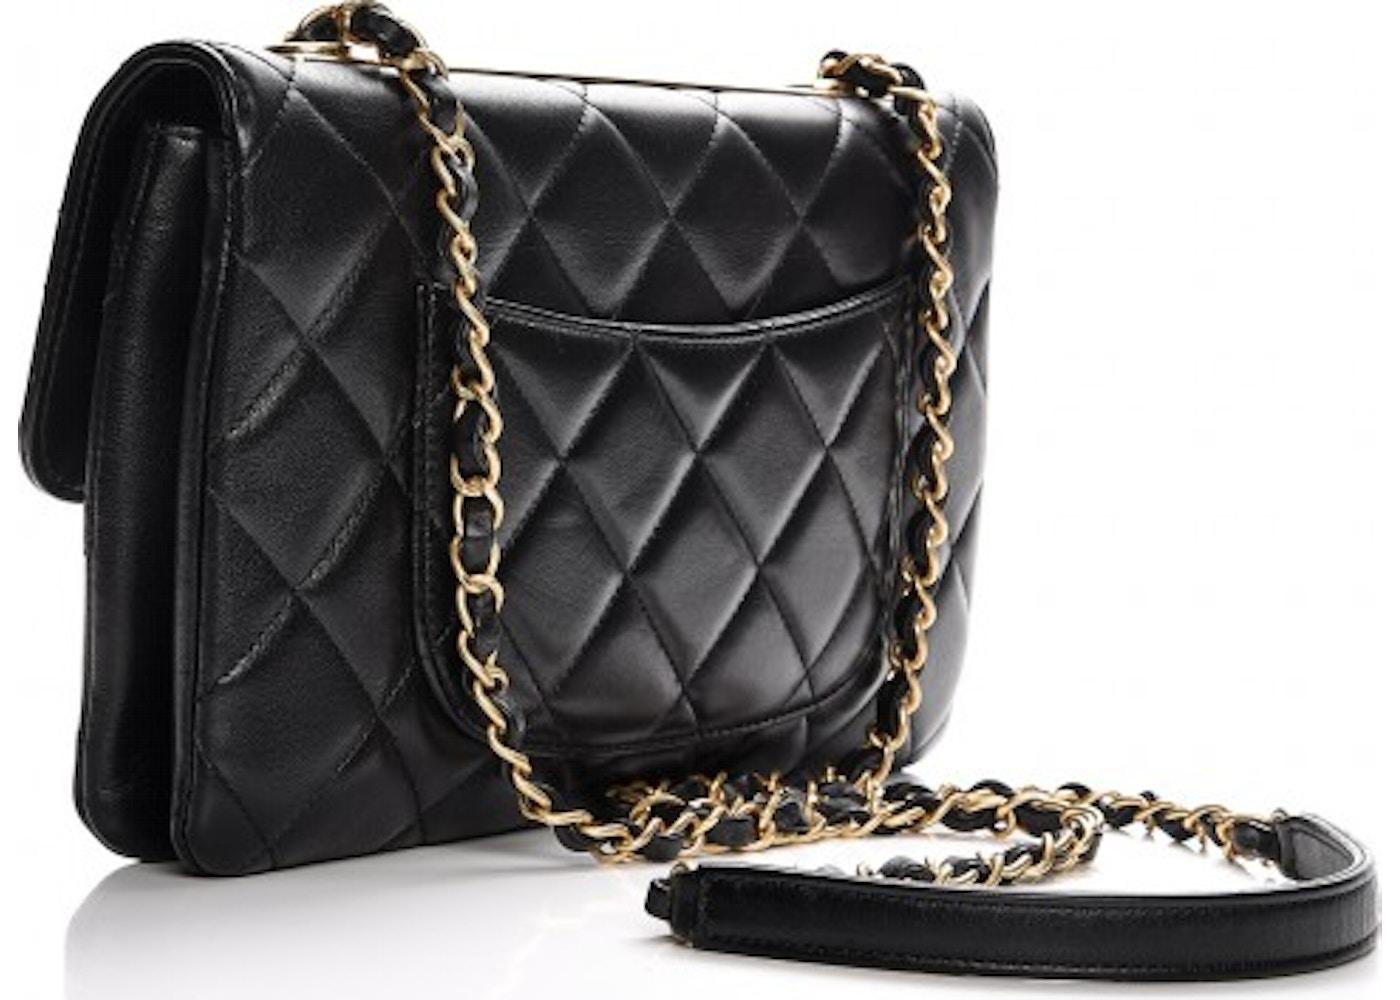 532ef1f0e81b Chanel Trendy CC Flap Diamond Quilted Medium Black